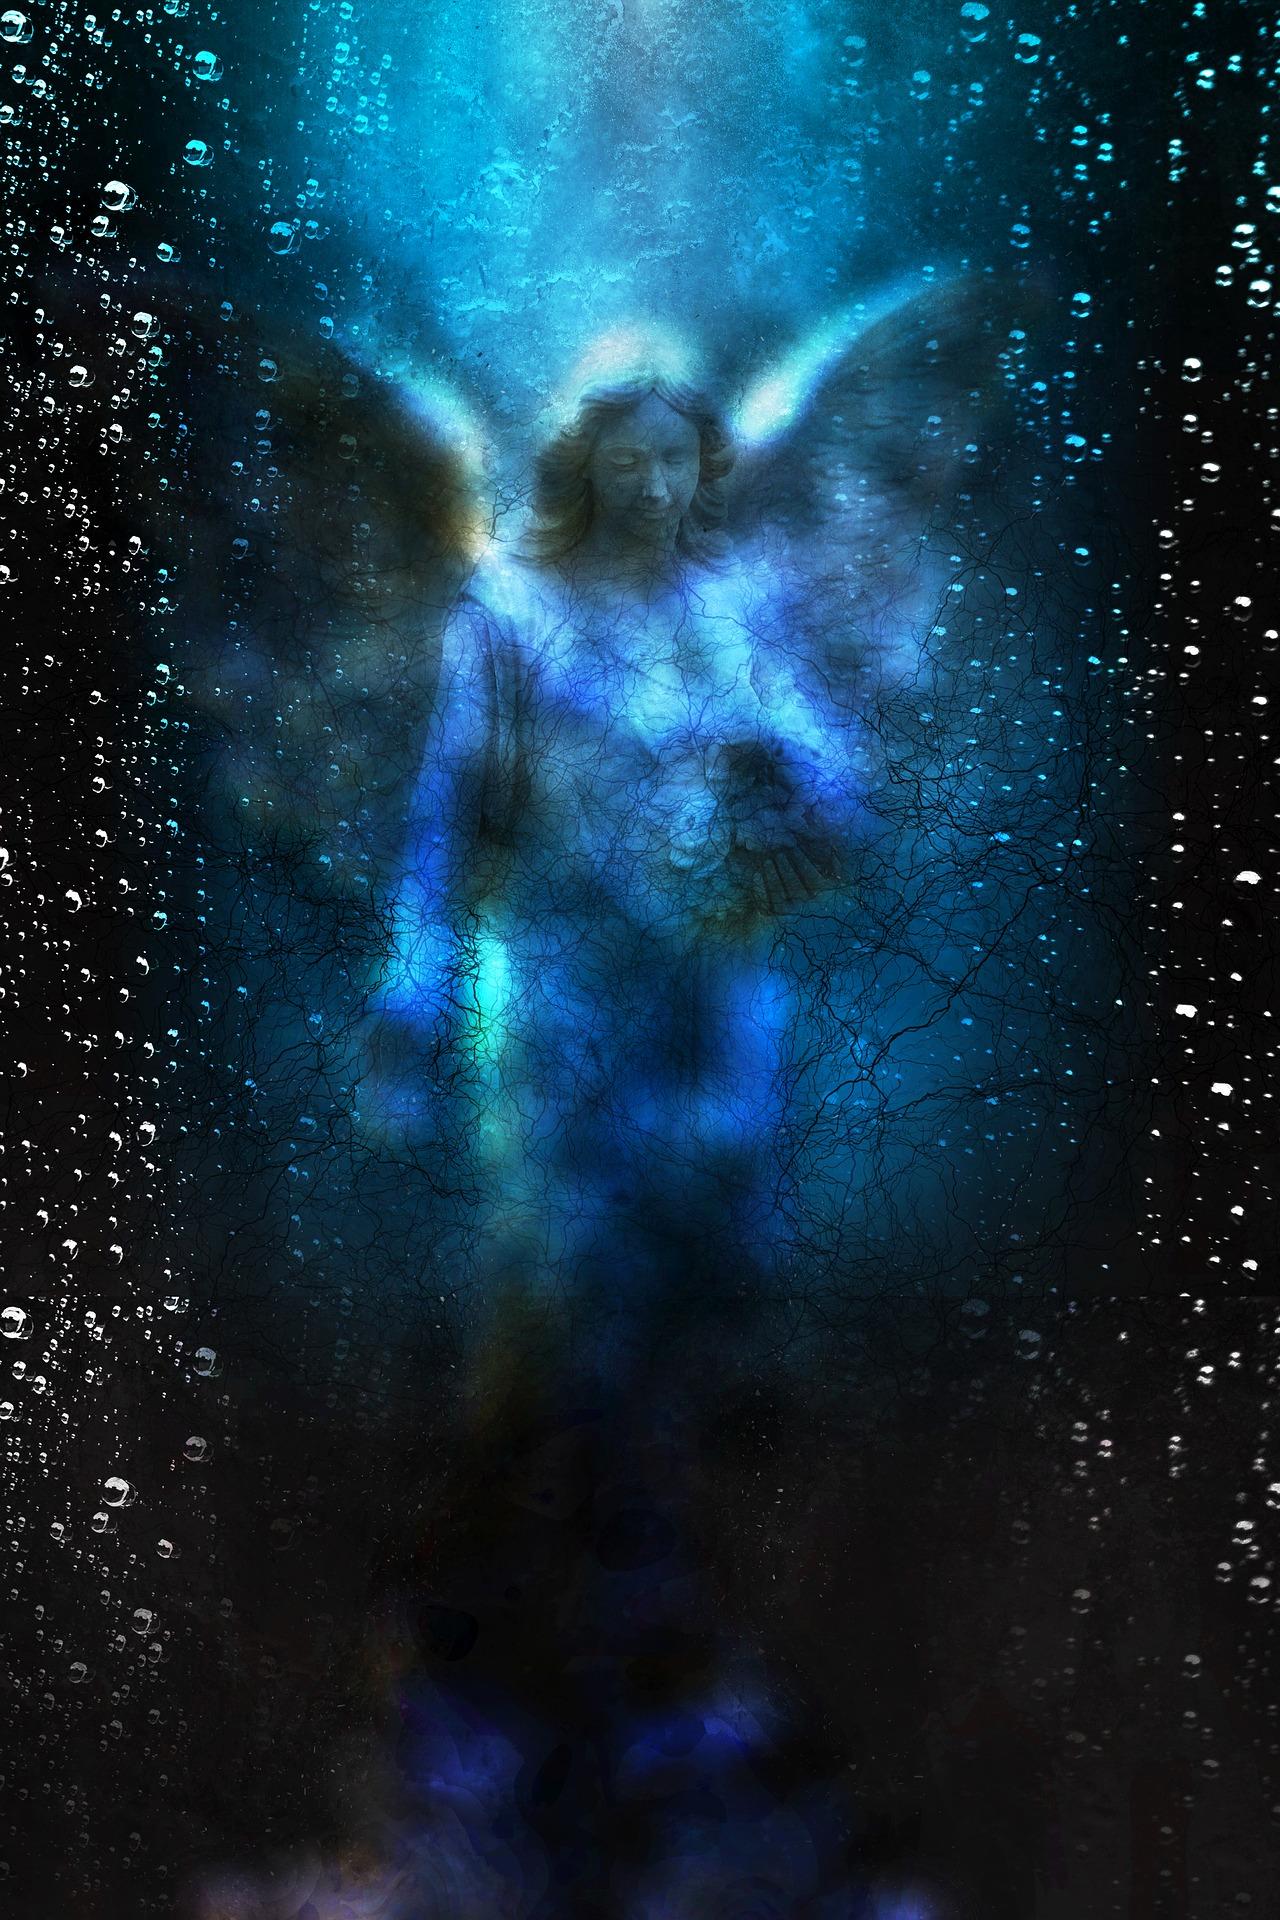 Angel 2580224 1920